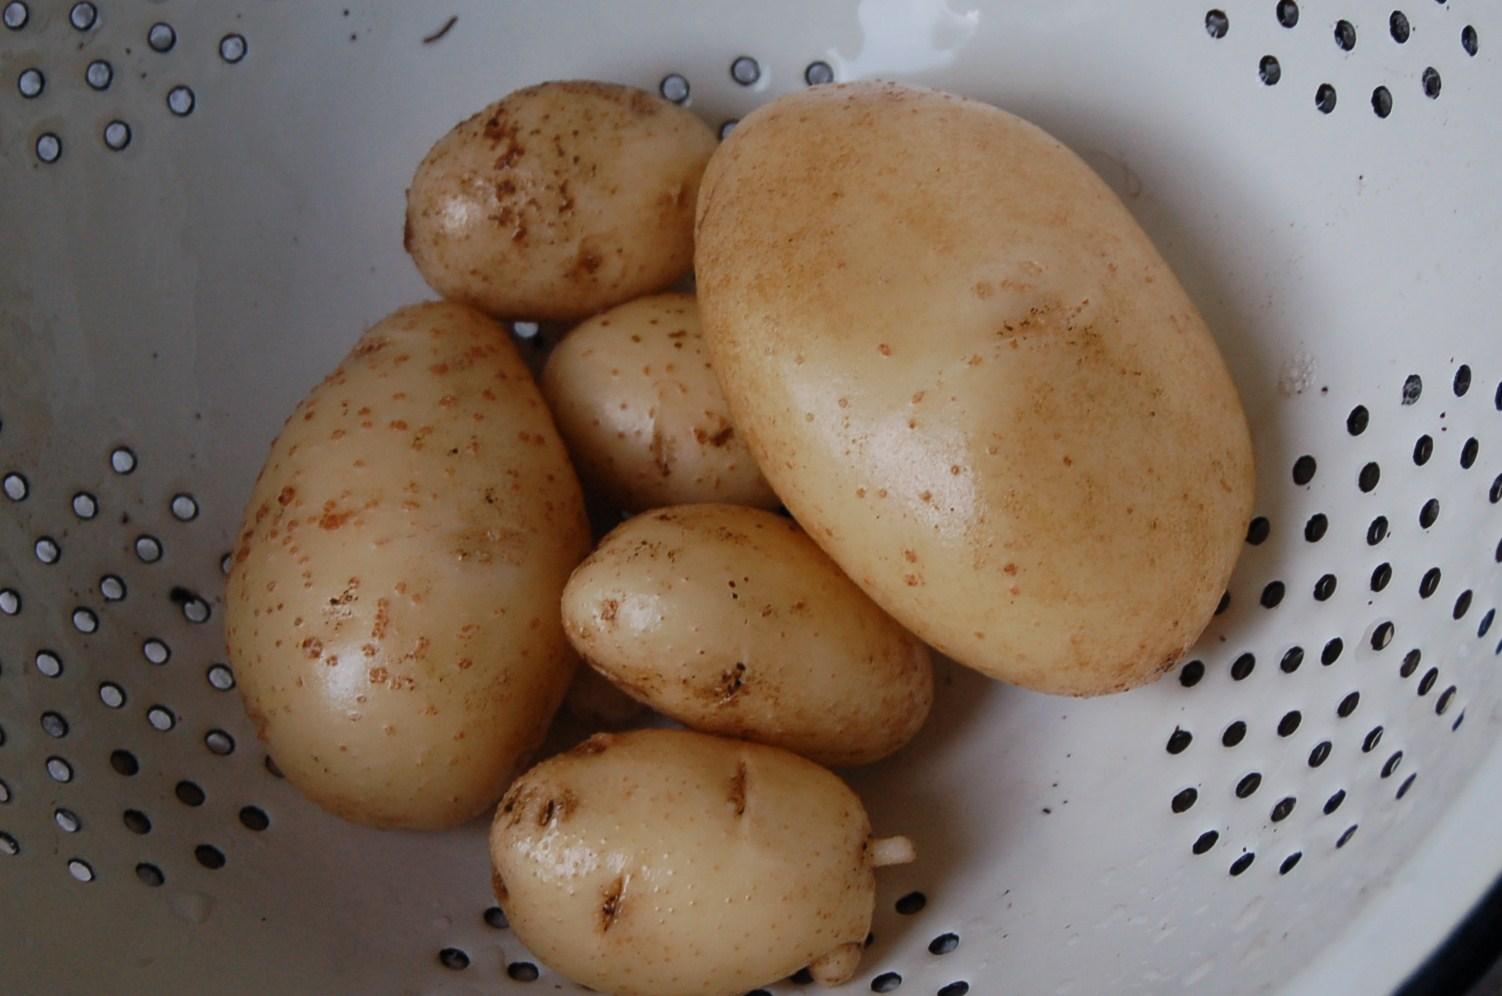 Beb sweet como sembrar patatas en casa for Como cultivar patatas